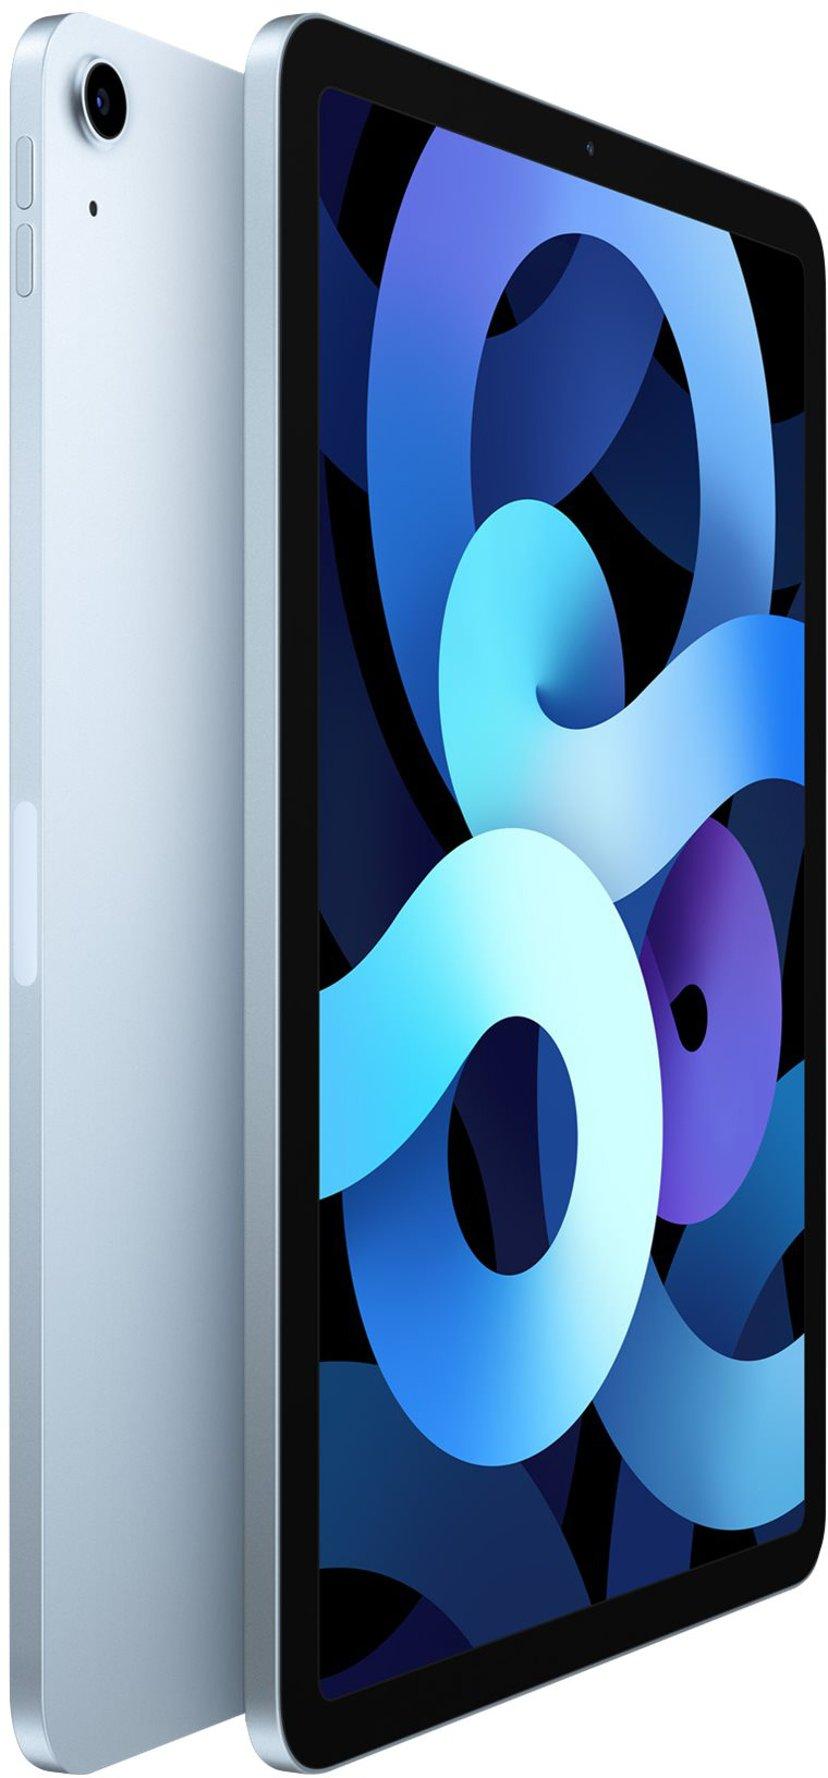 "Apple iPad Air 4th gen (2020) WiFi + Cellular 10.9"" A14 Bionic 64GB Himmelsblå"